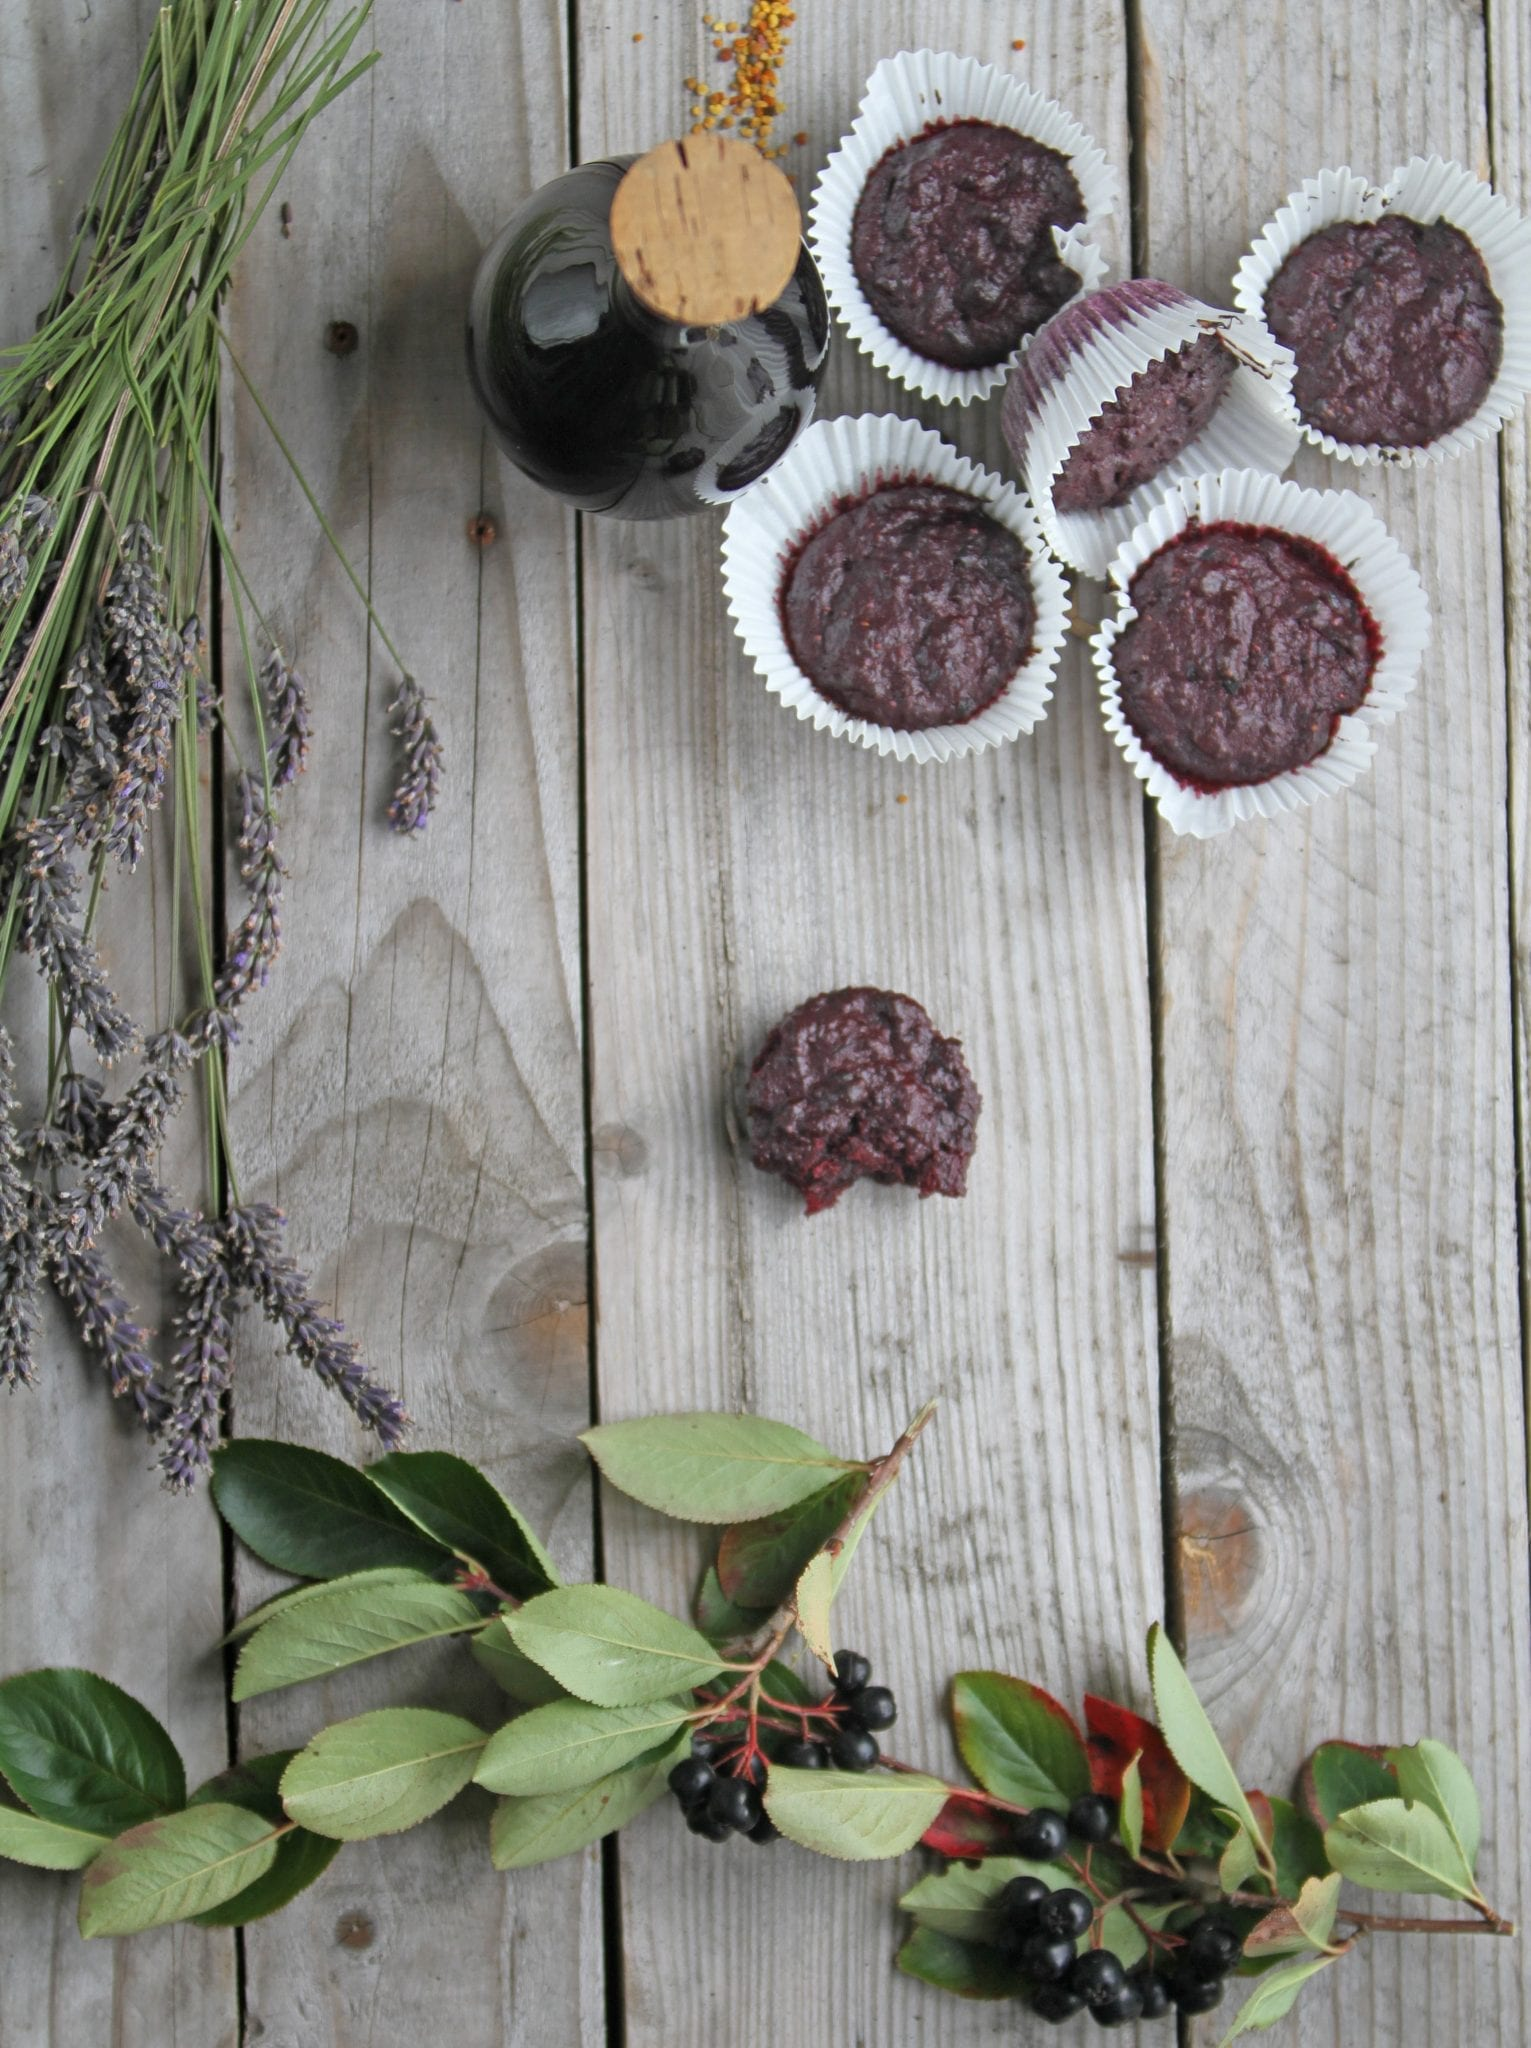 aroniamuffin Aronia muffins - lavet på resterne fra aronia sirup